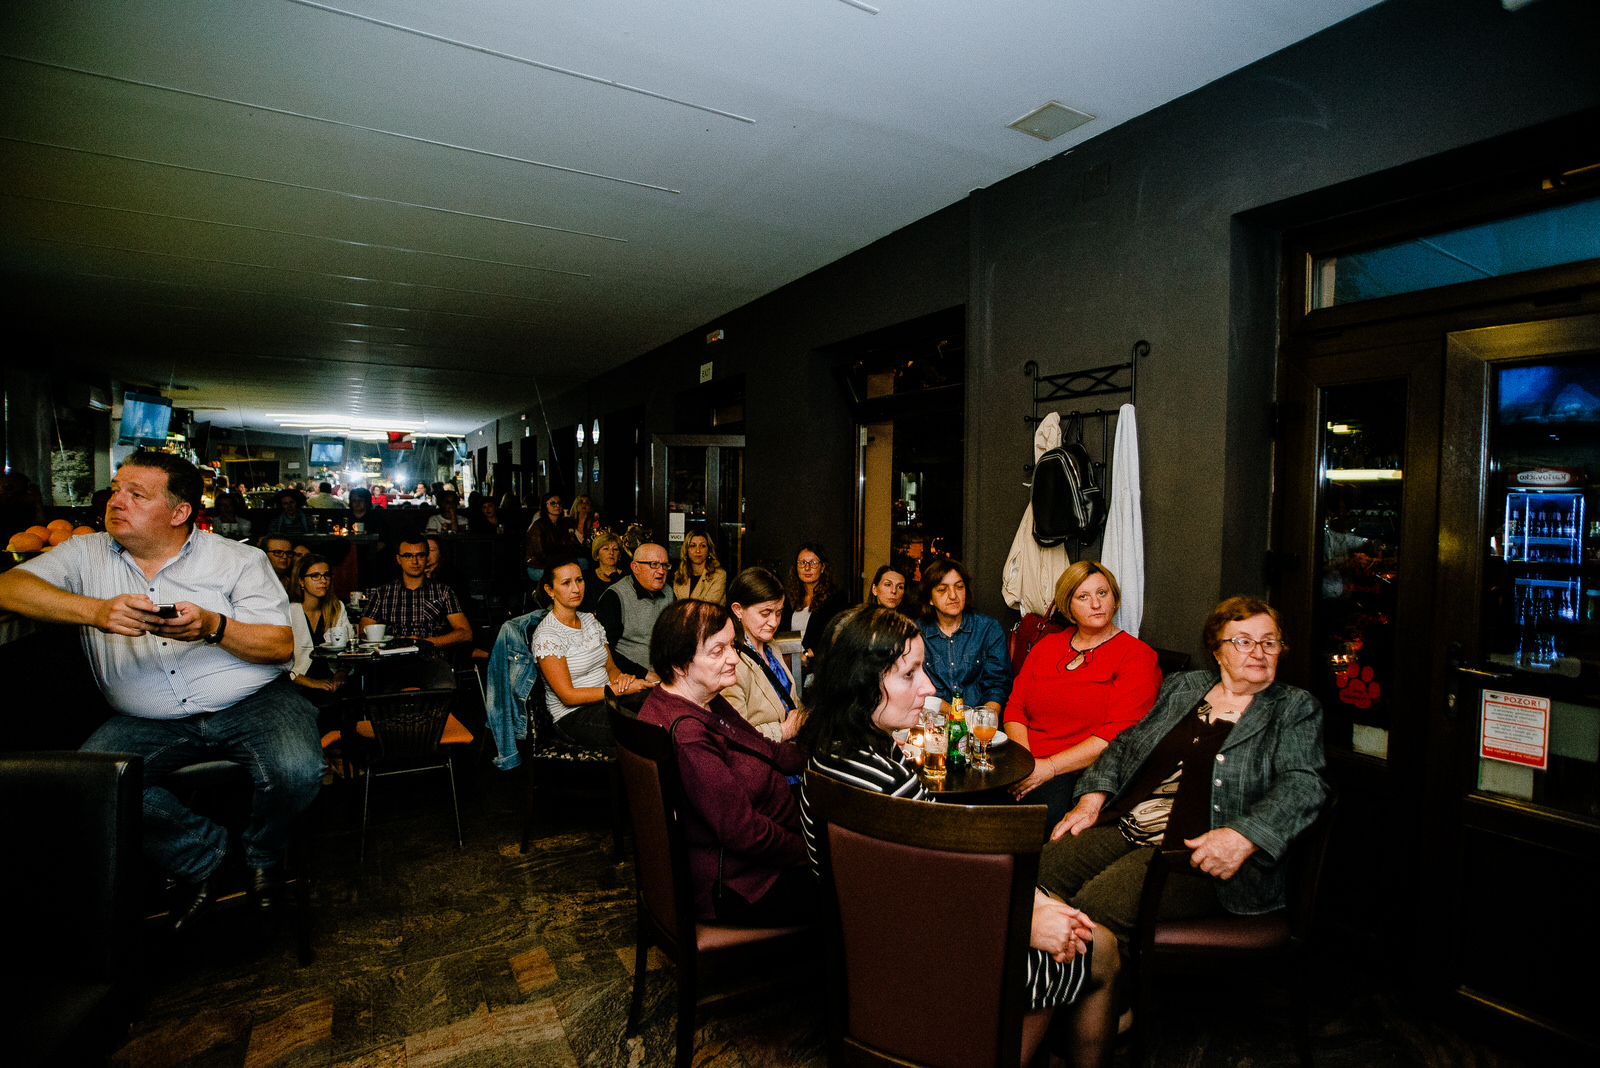 likaclub_otočac_book-caffe-paradisso_kenan-crnkić_2019-13